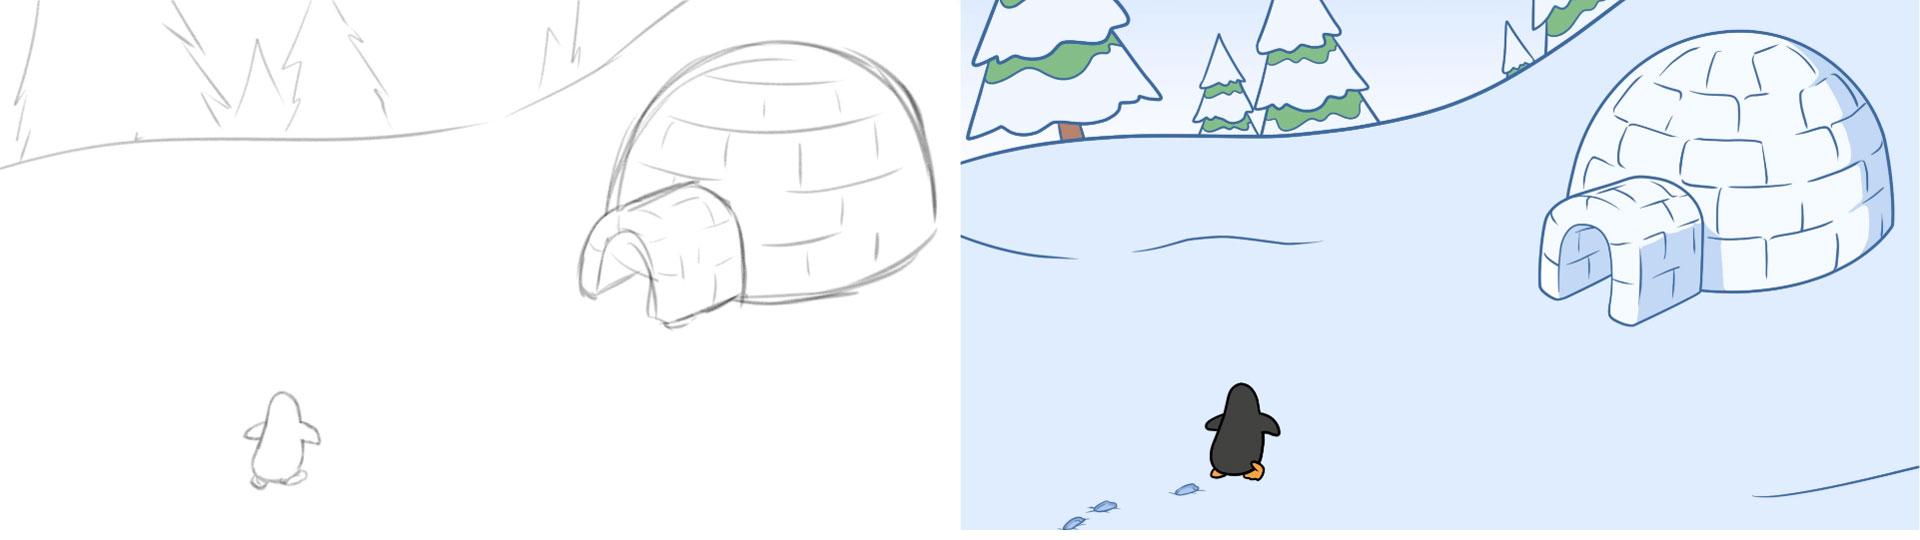 Penguin Basements penguin igloo video animation image